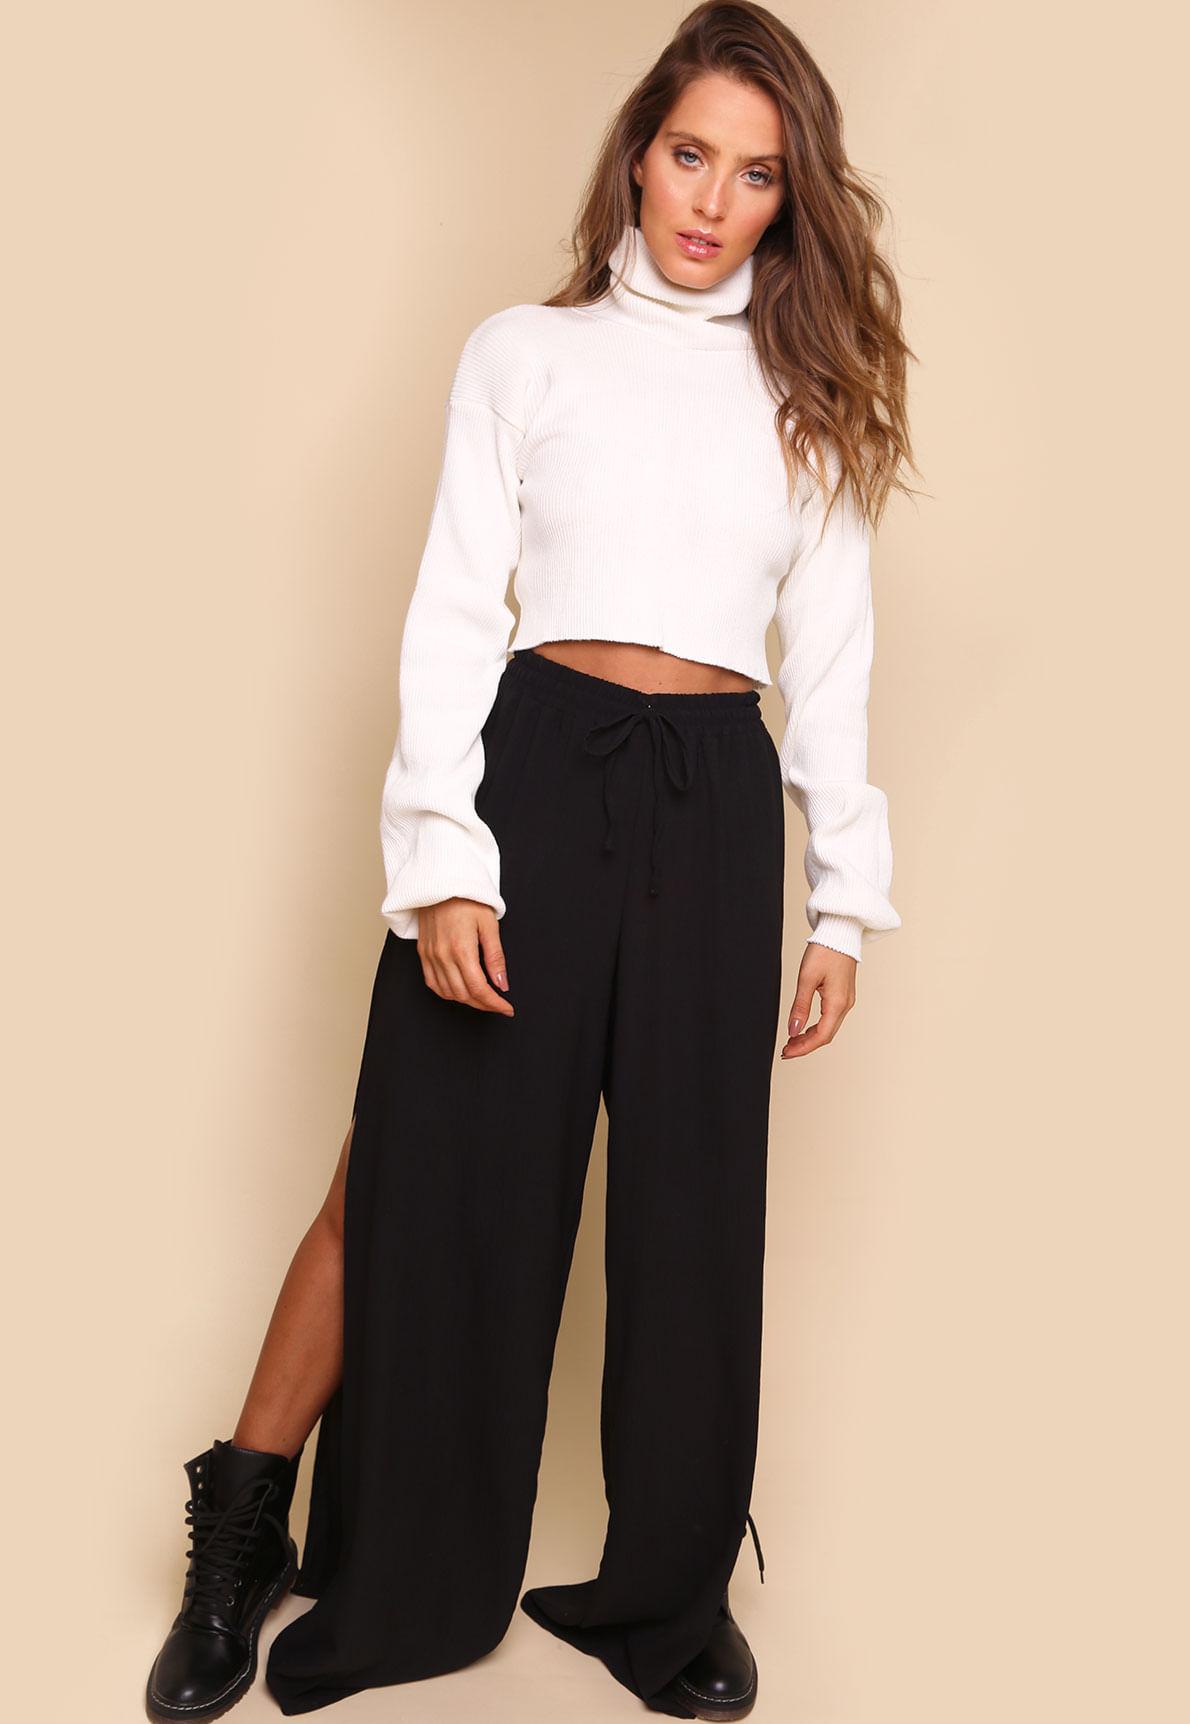 31314-calca-pantalona-fendas-belle-01